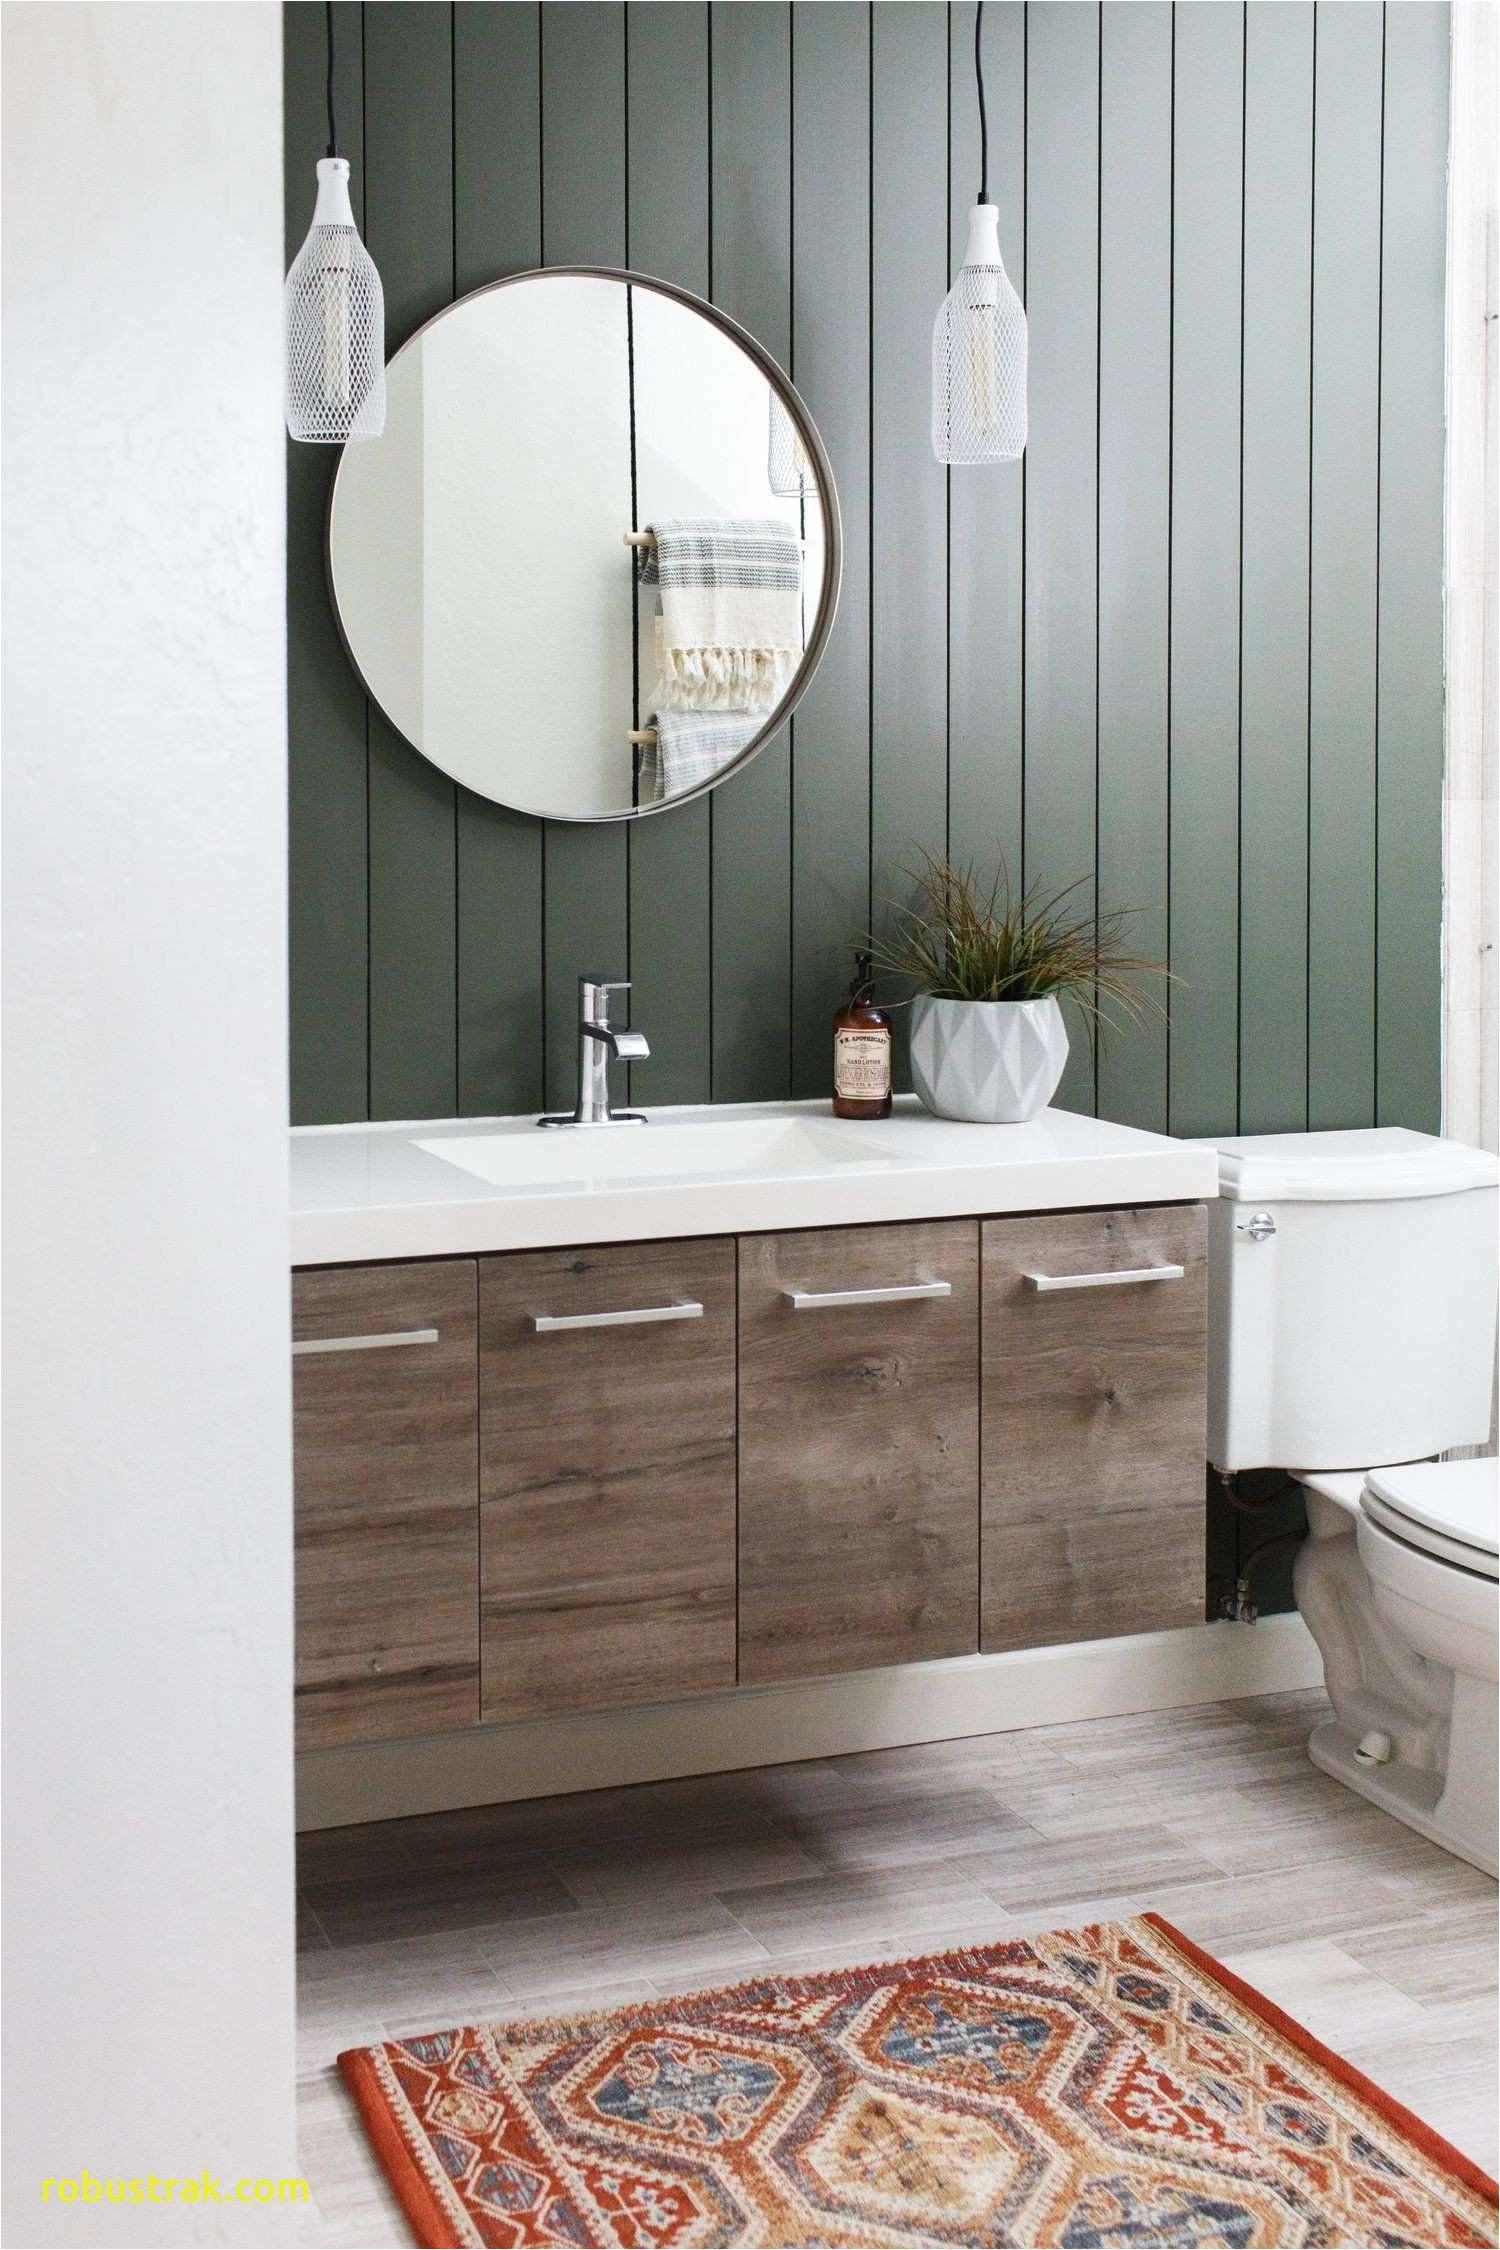 bathroom bathrooms design unique diy bathroom light luxury h sink install bathroom i 0d exciting new 33 collection bathroom tiling ideas